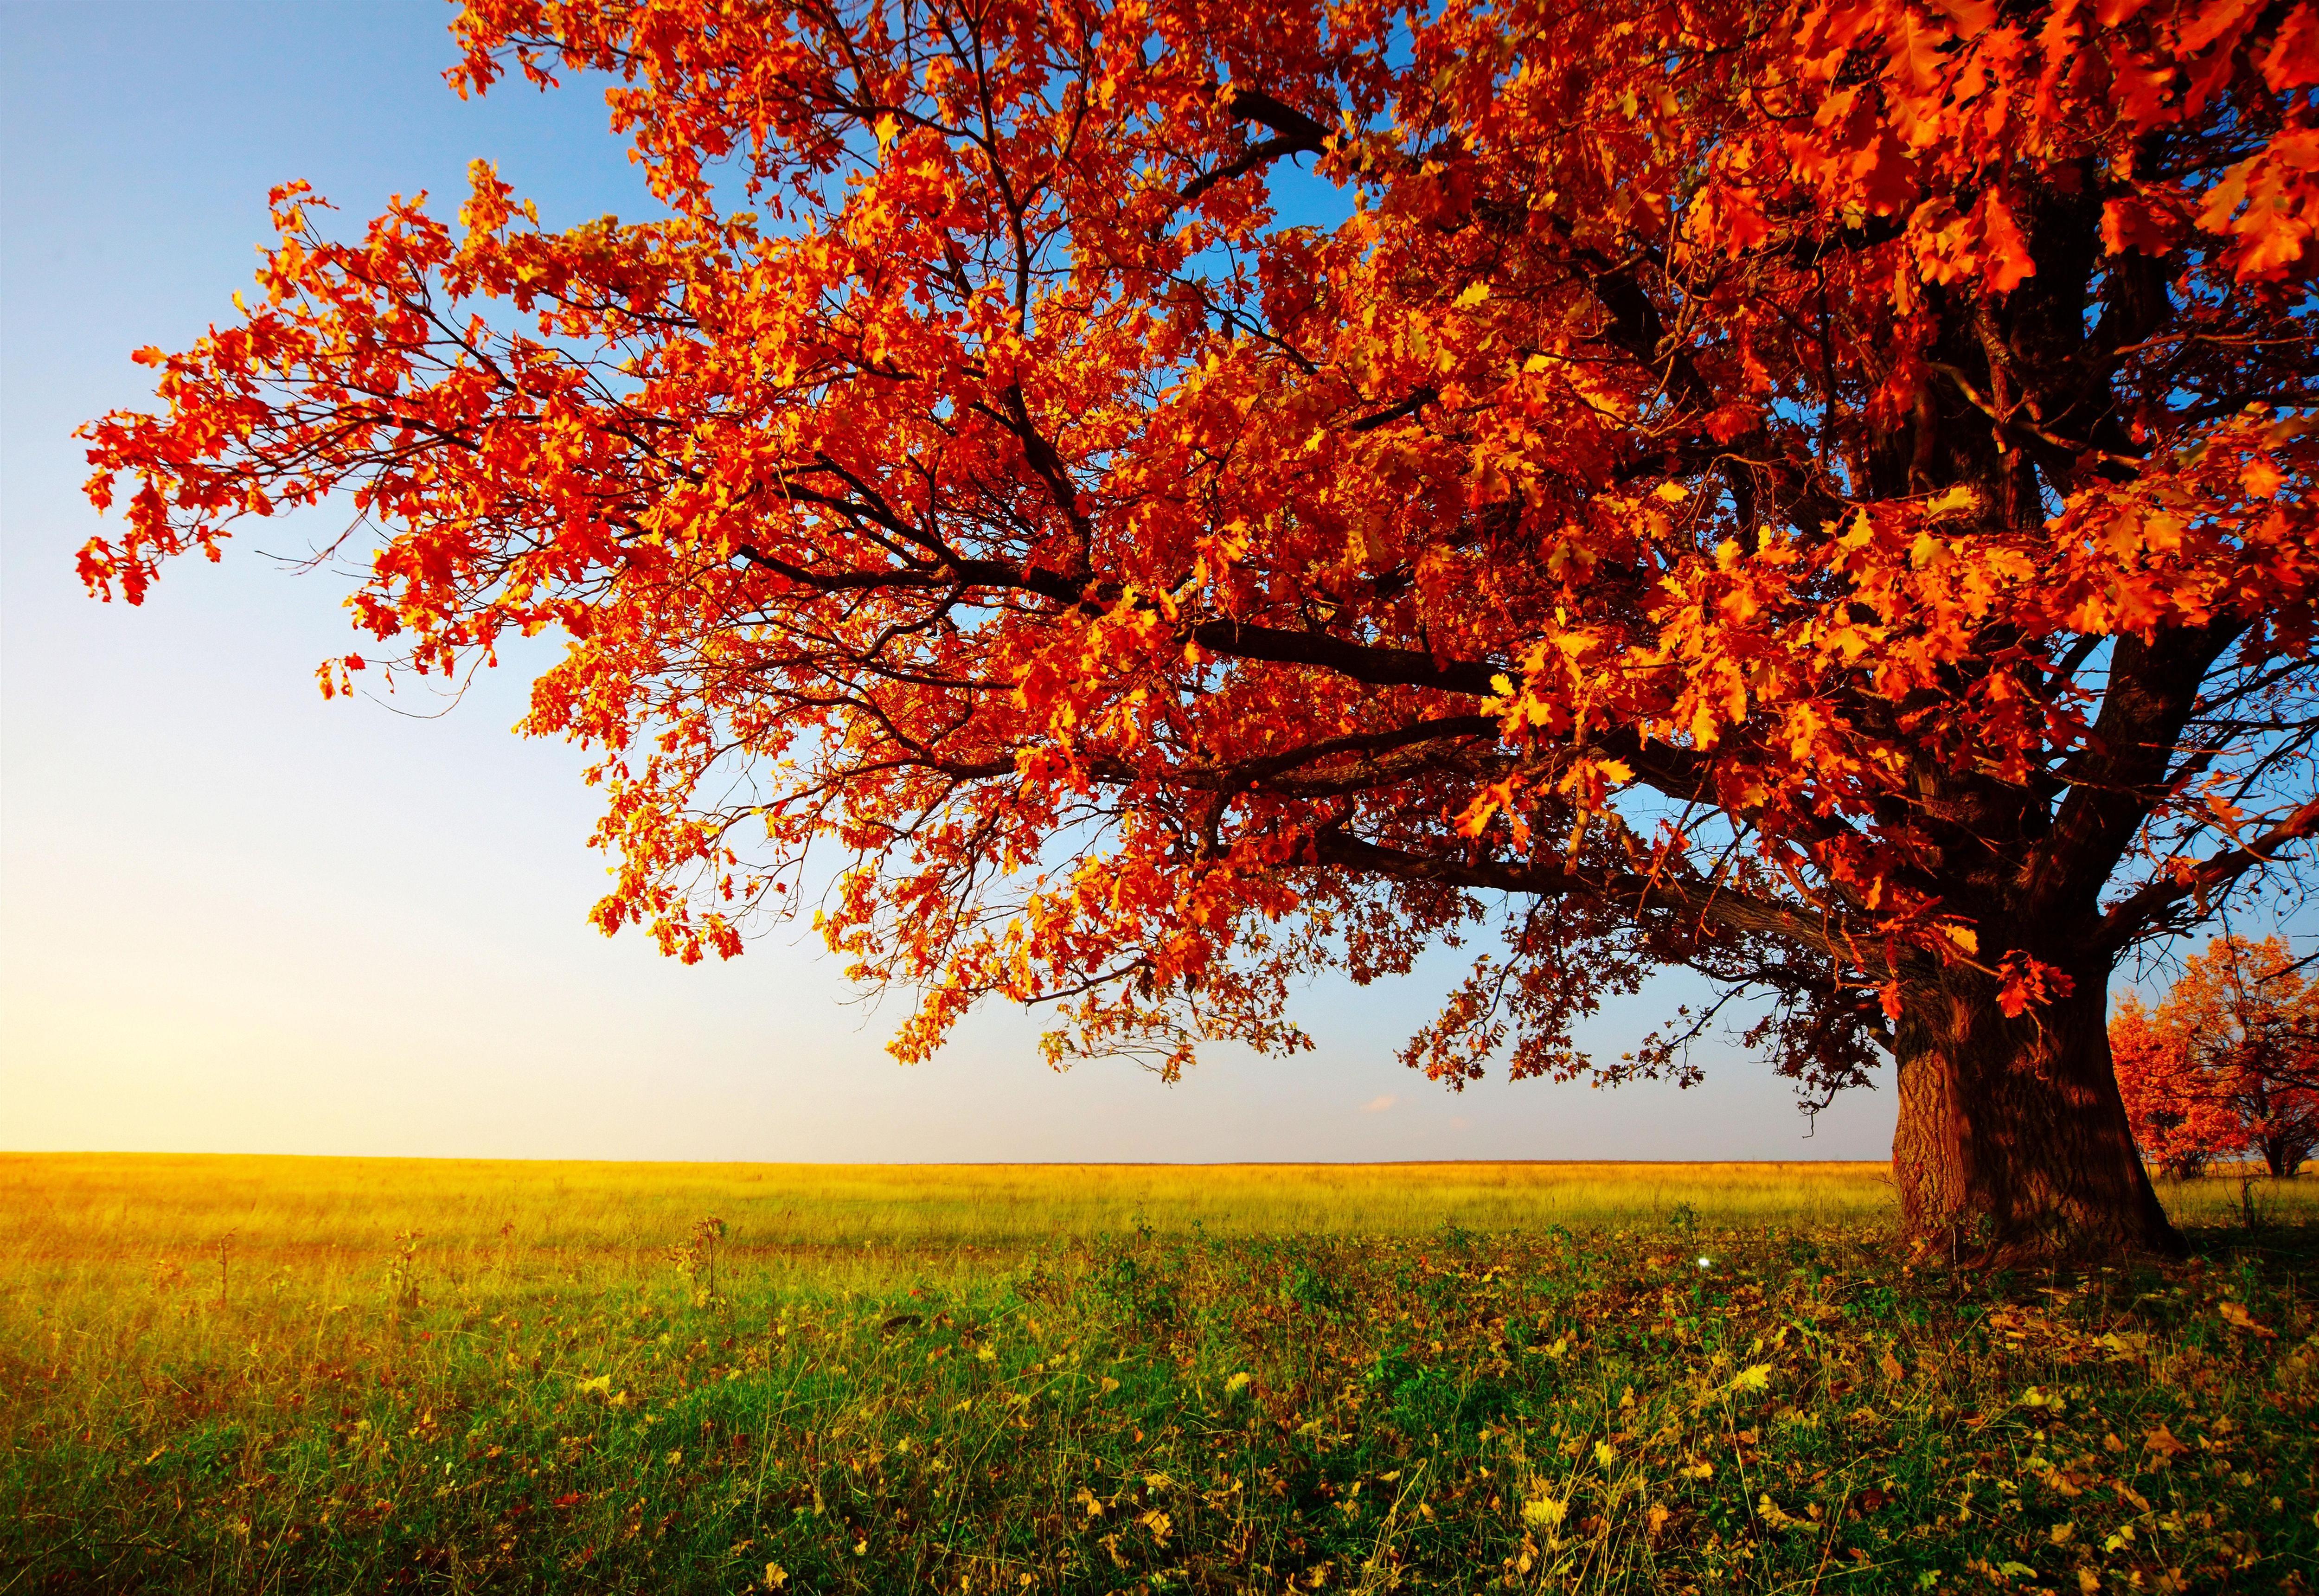 autumn fall tree backgrounds - photo #6